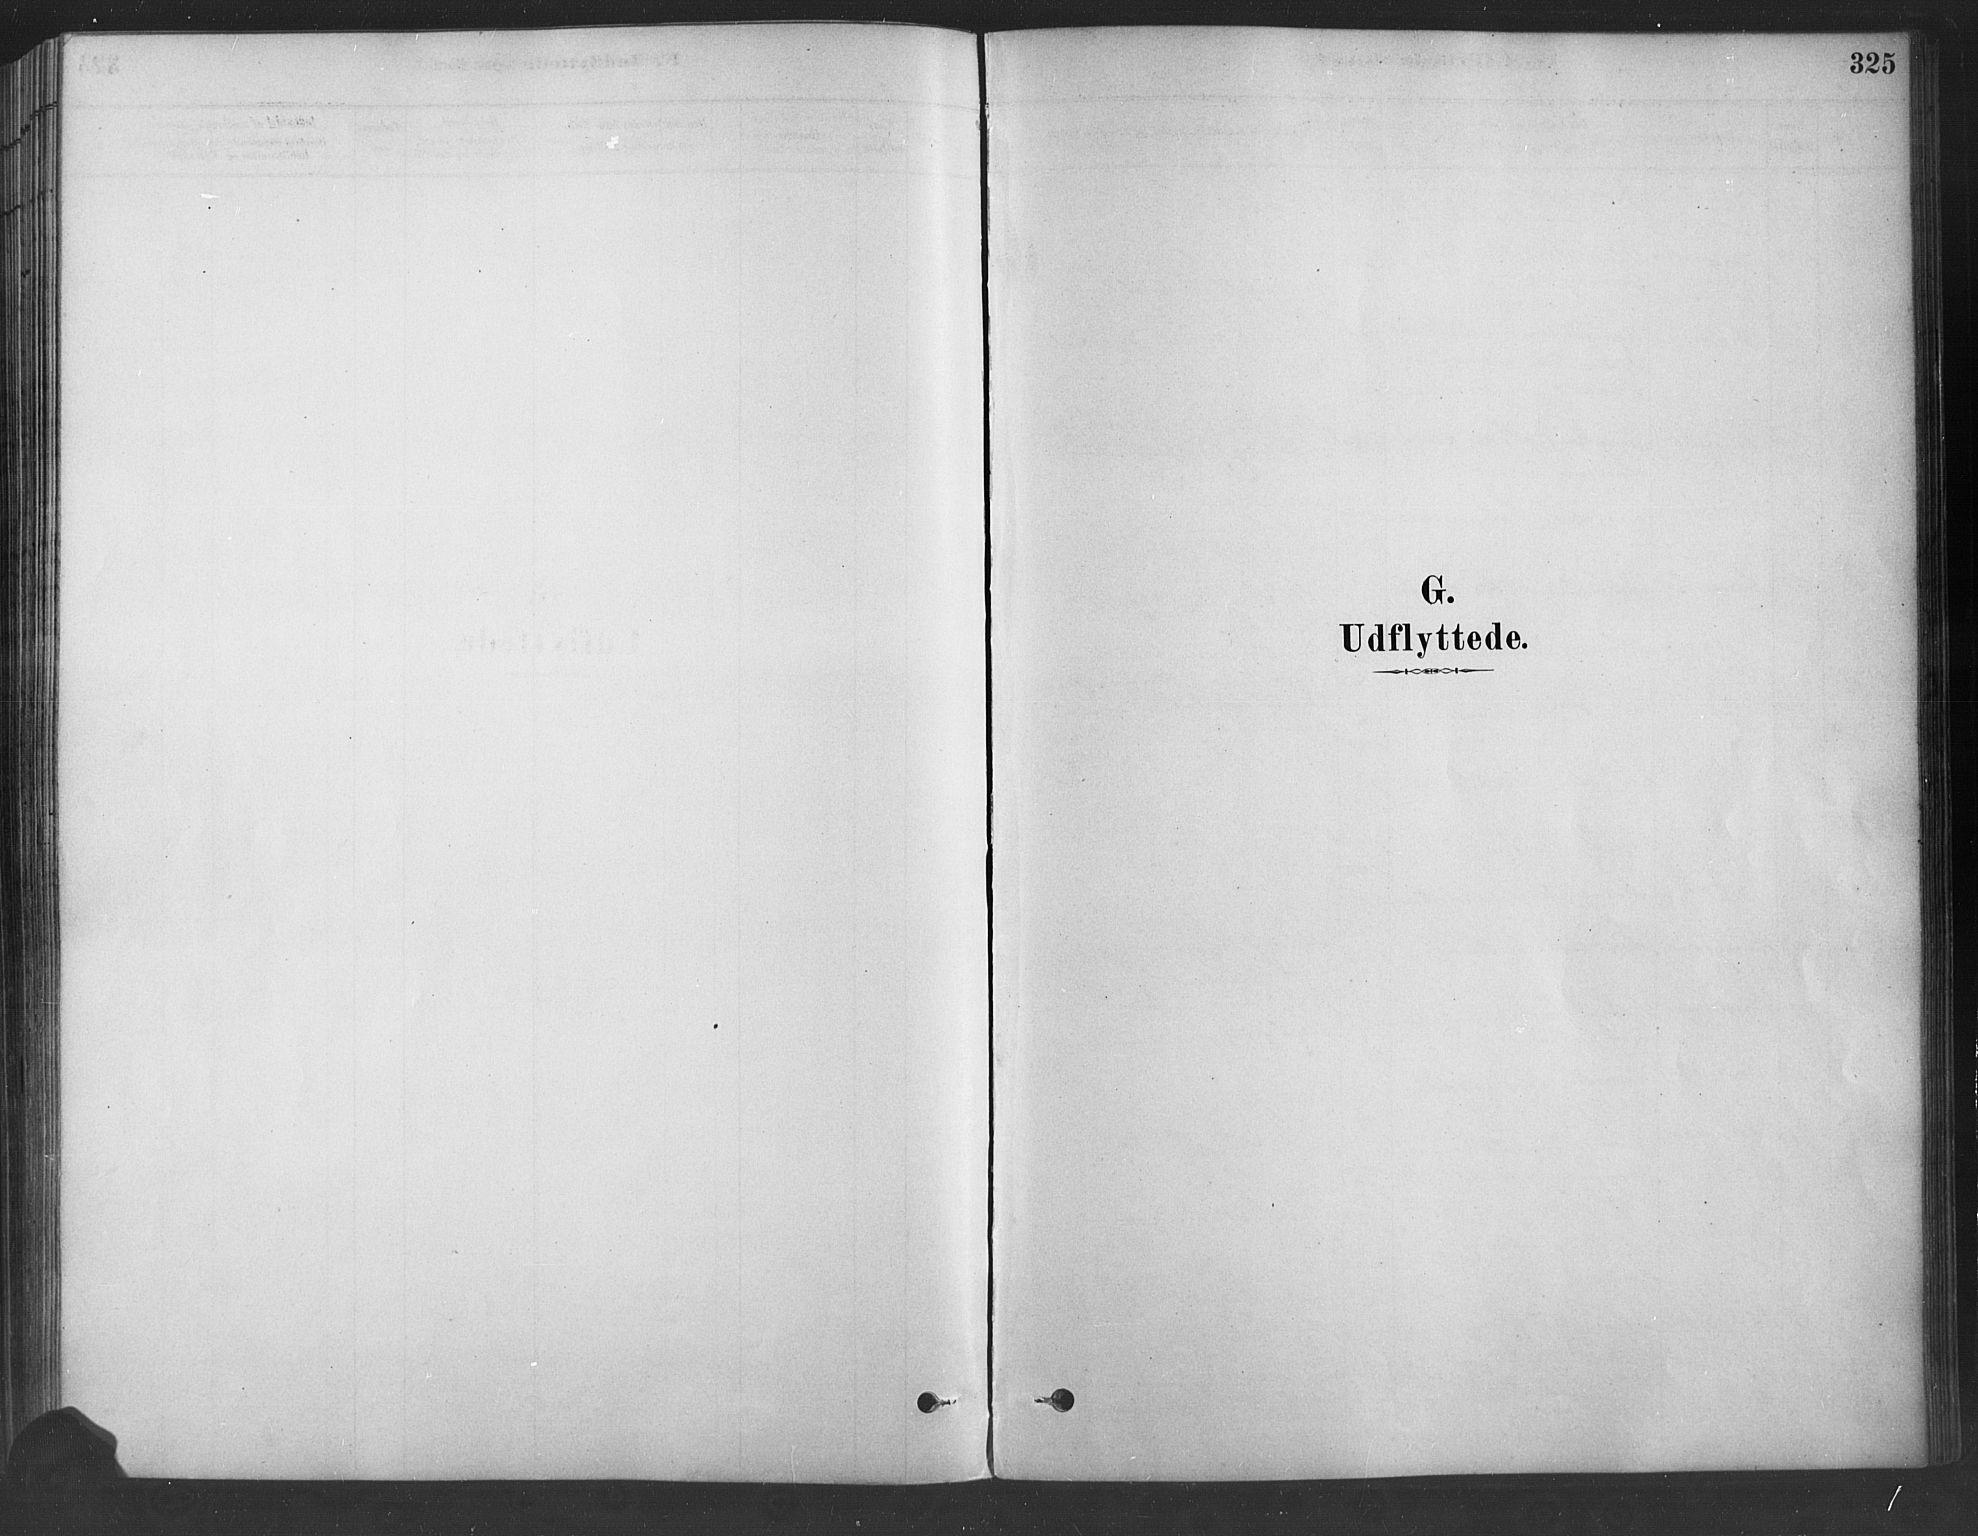 SAH, Fåberg prestekontor, Ministerialbok nr. 9, 1879-1898, s. 325